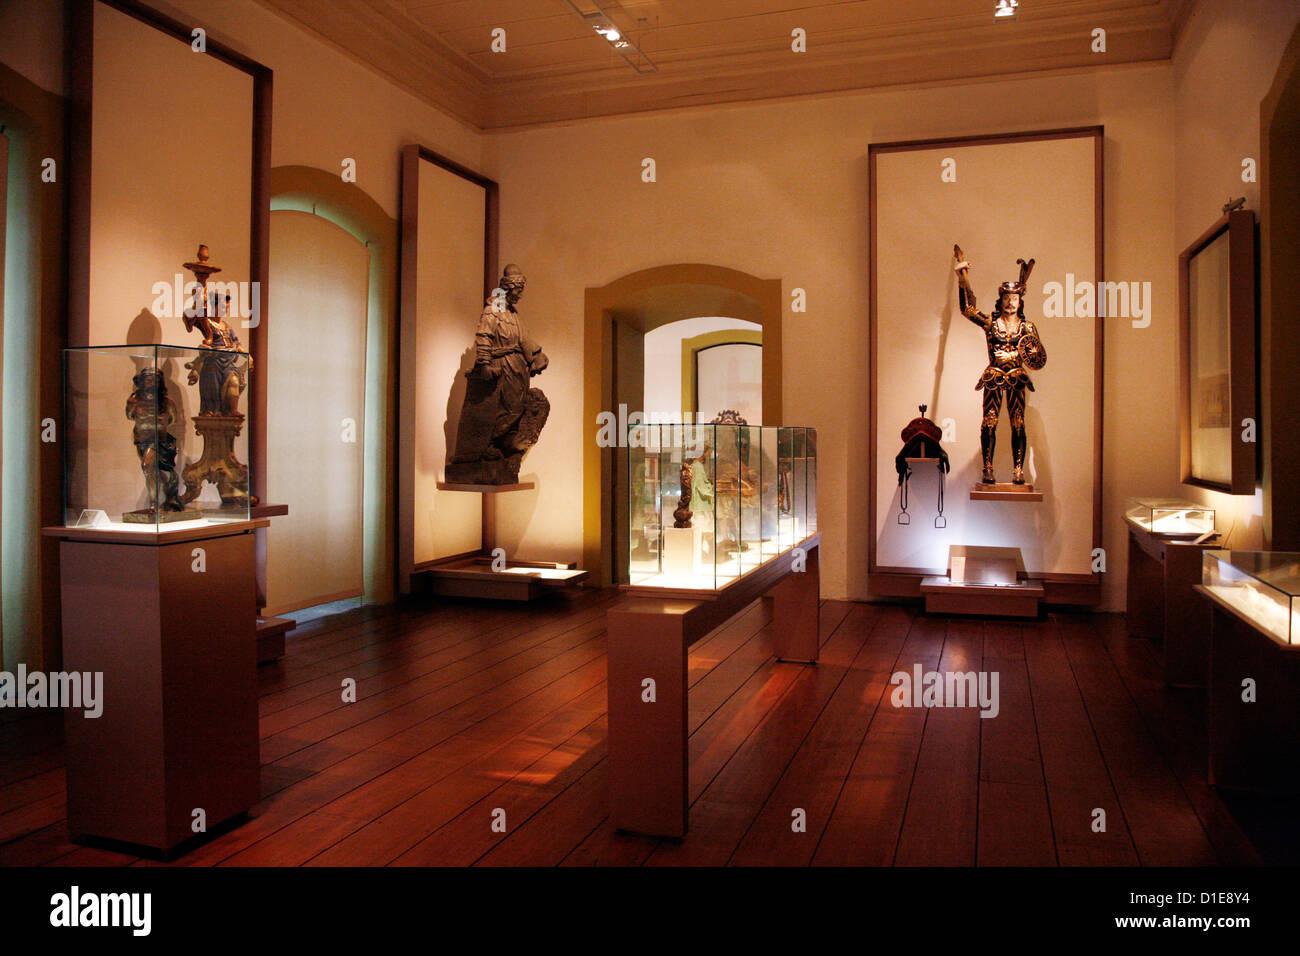 View of the room showing sculptures and works by Aleijadinho at Museu da Inconfidencia, Ouro Preto,  Minas Gerais, - Stock Image